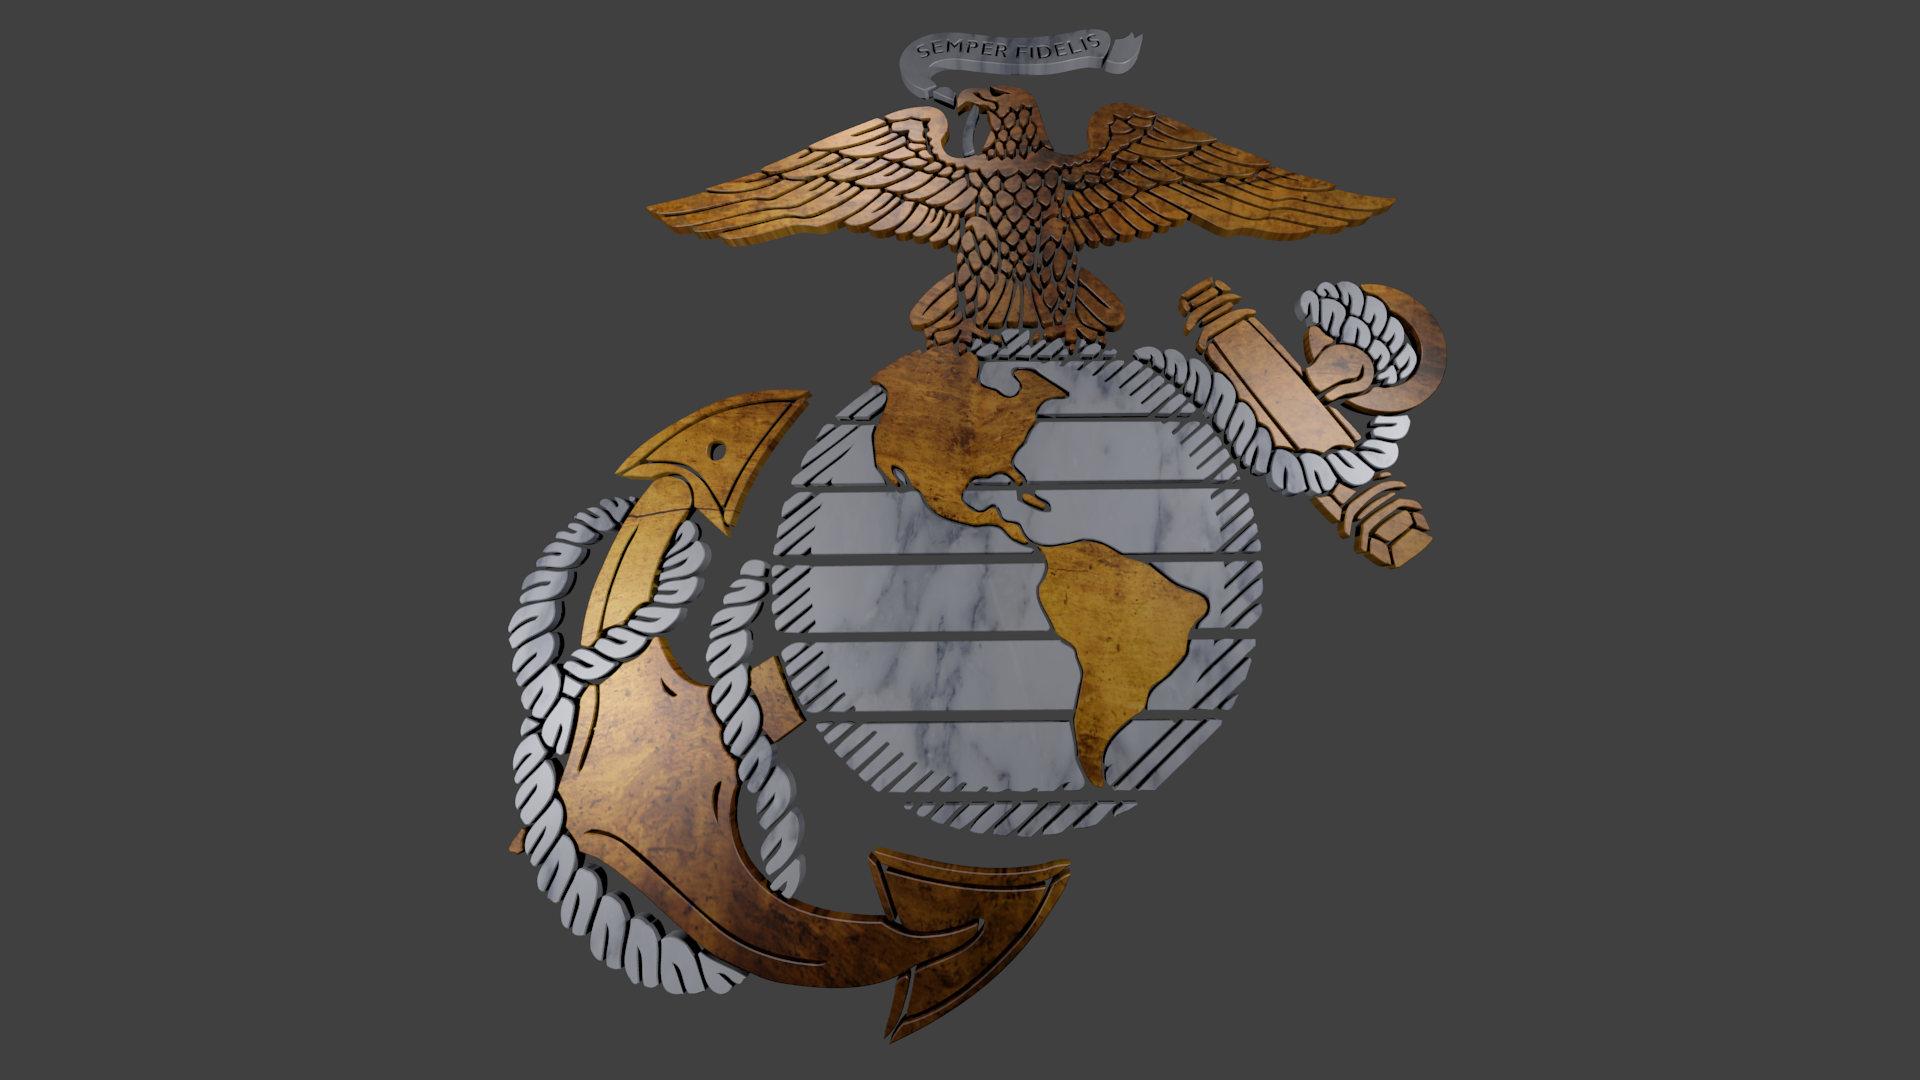 God bless the marine corps